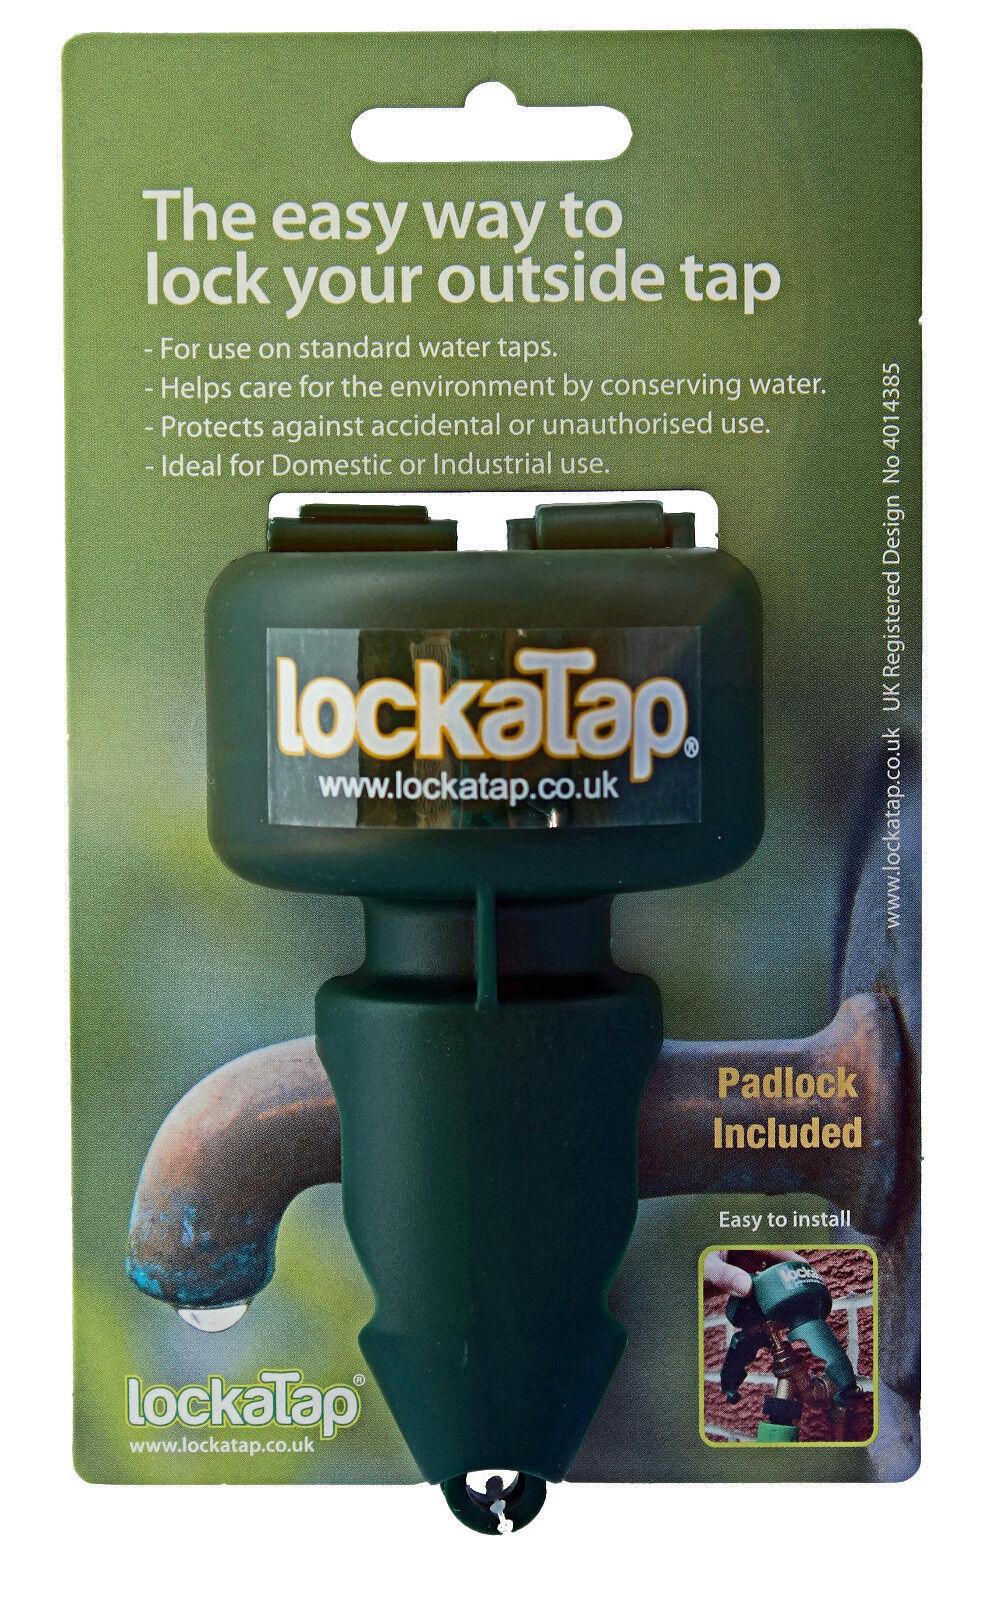 LOCKATAP OUTSIDE GARDEN TAP LOCK- PROTECTIVE COVER MADE IN UK